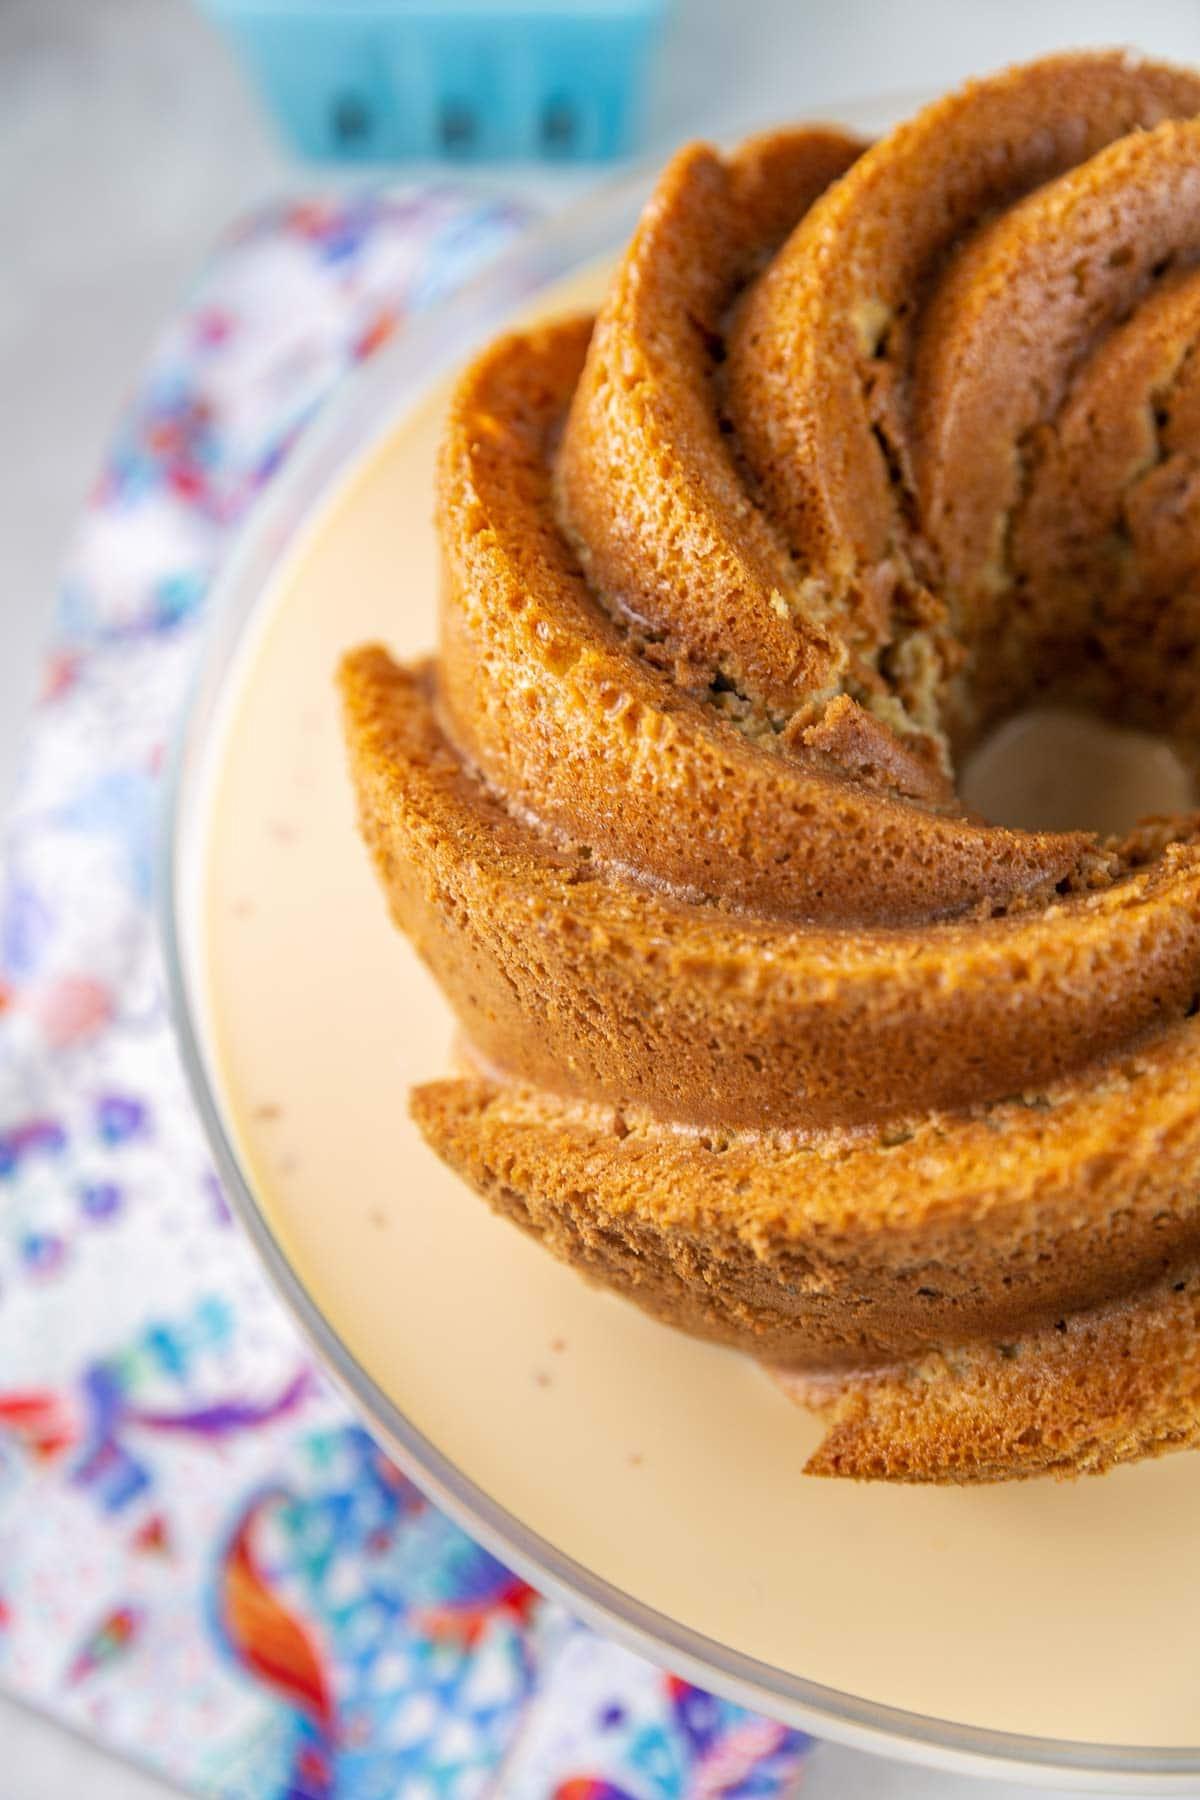 sponge bundt cake sitting on a plate soaking up tres leches milk mixture